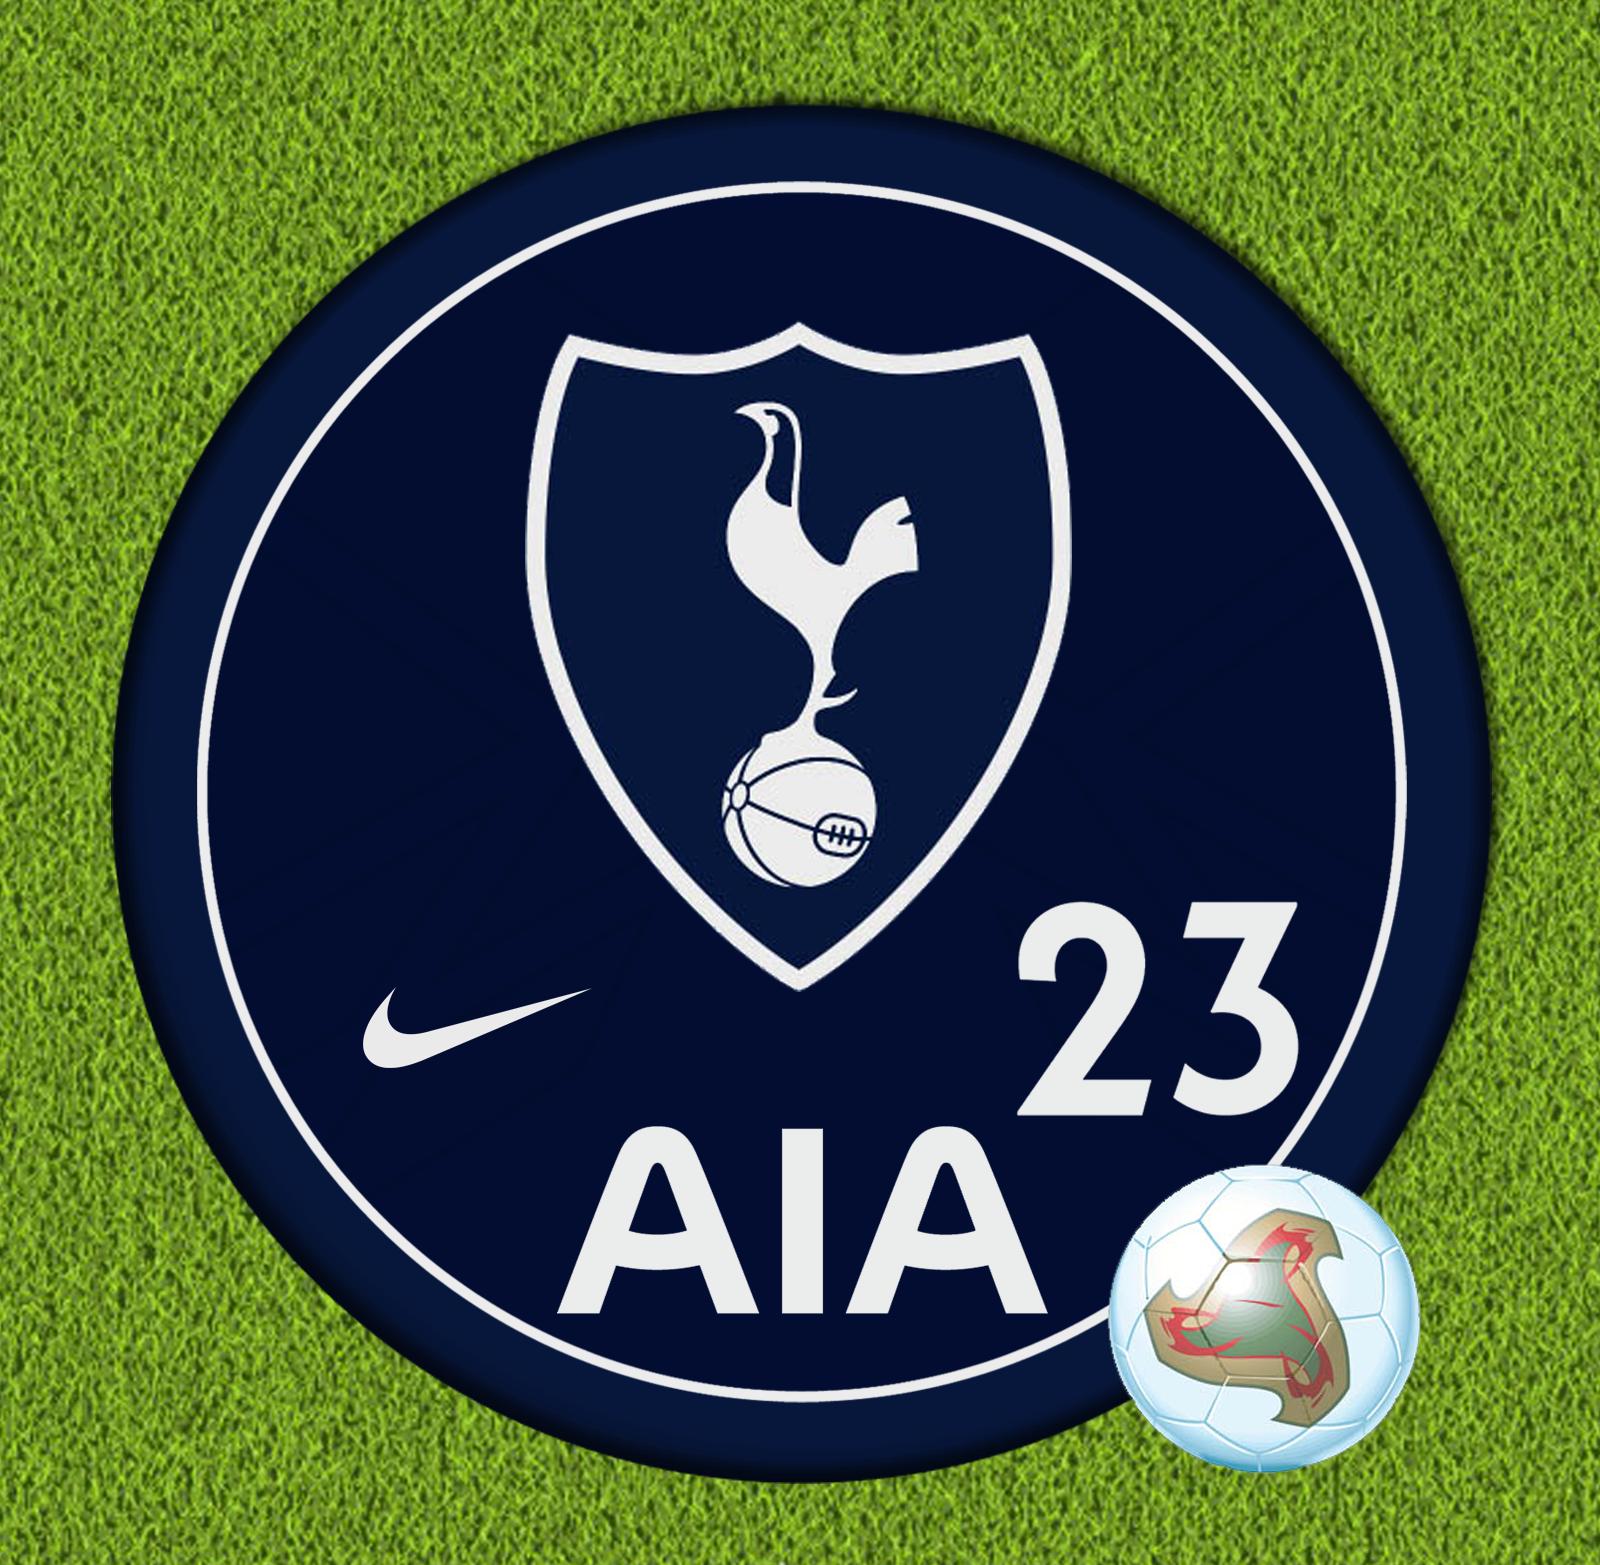 Escudos Ferreira Tottenham 2017 2018